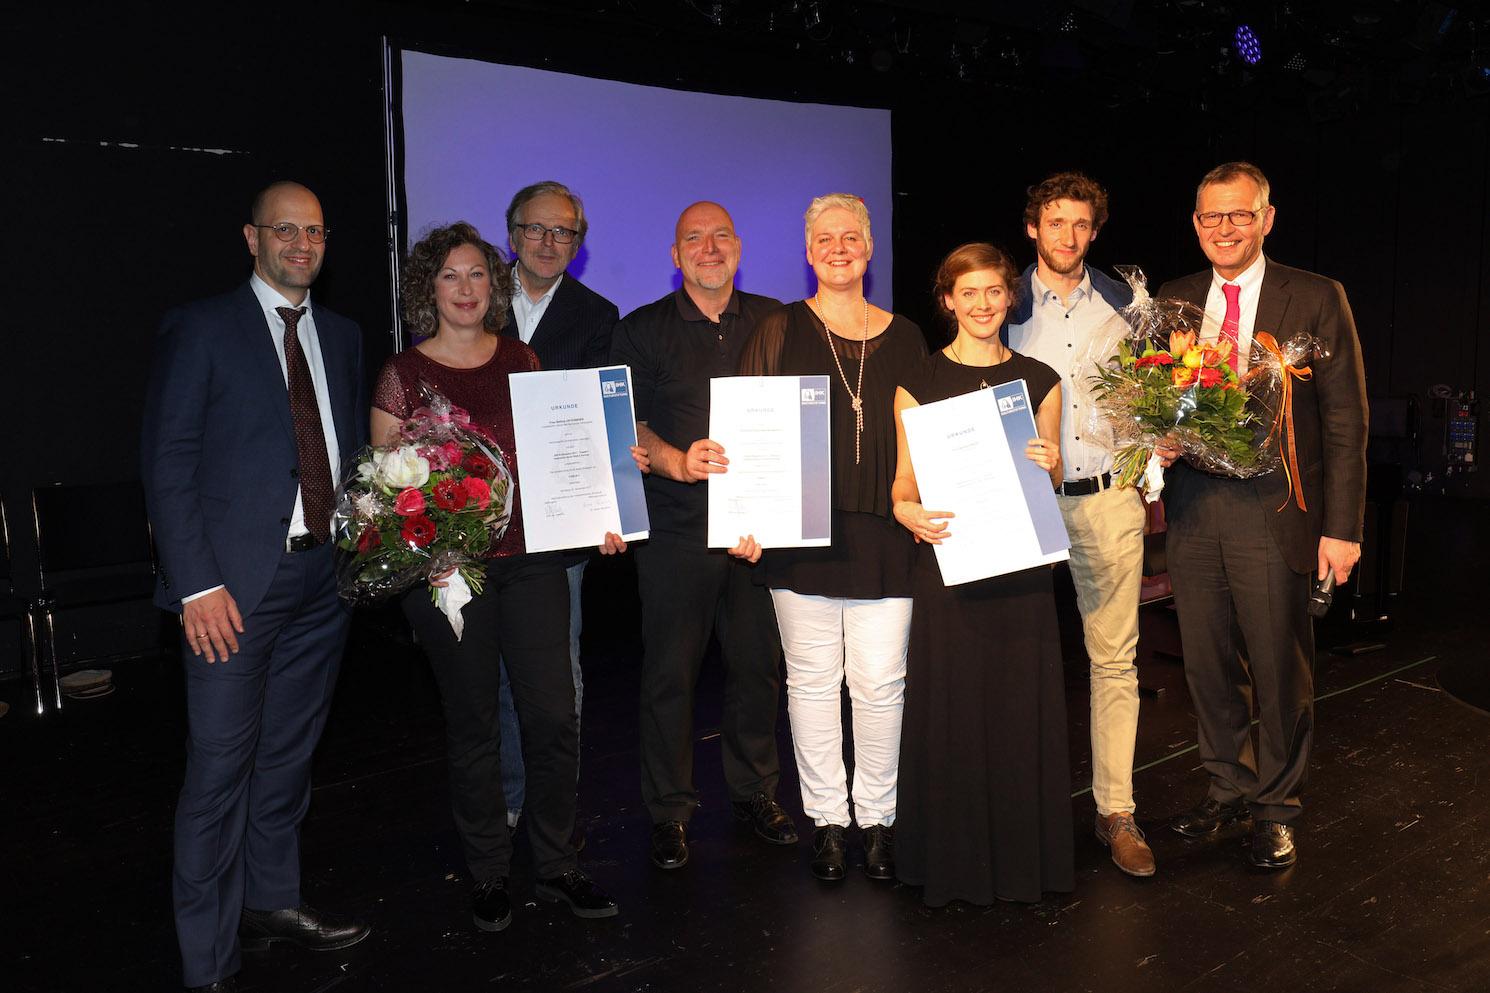 IHK Kulturpreis 2017